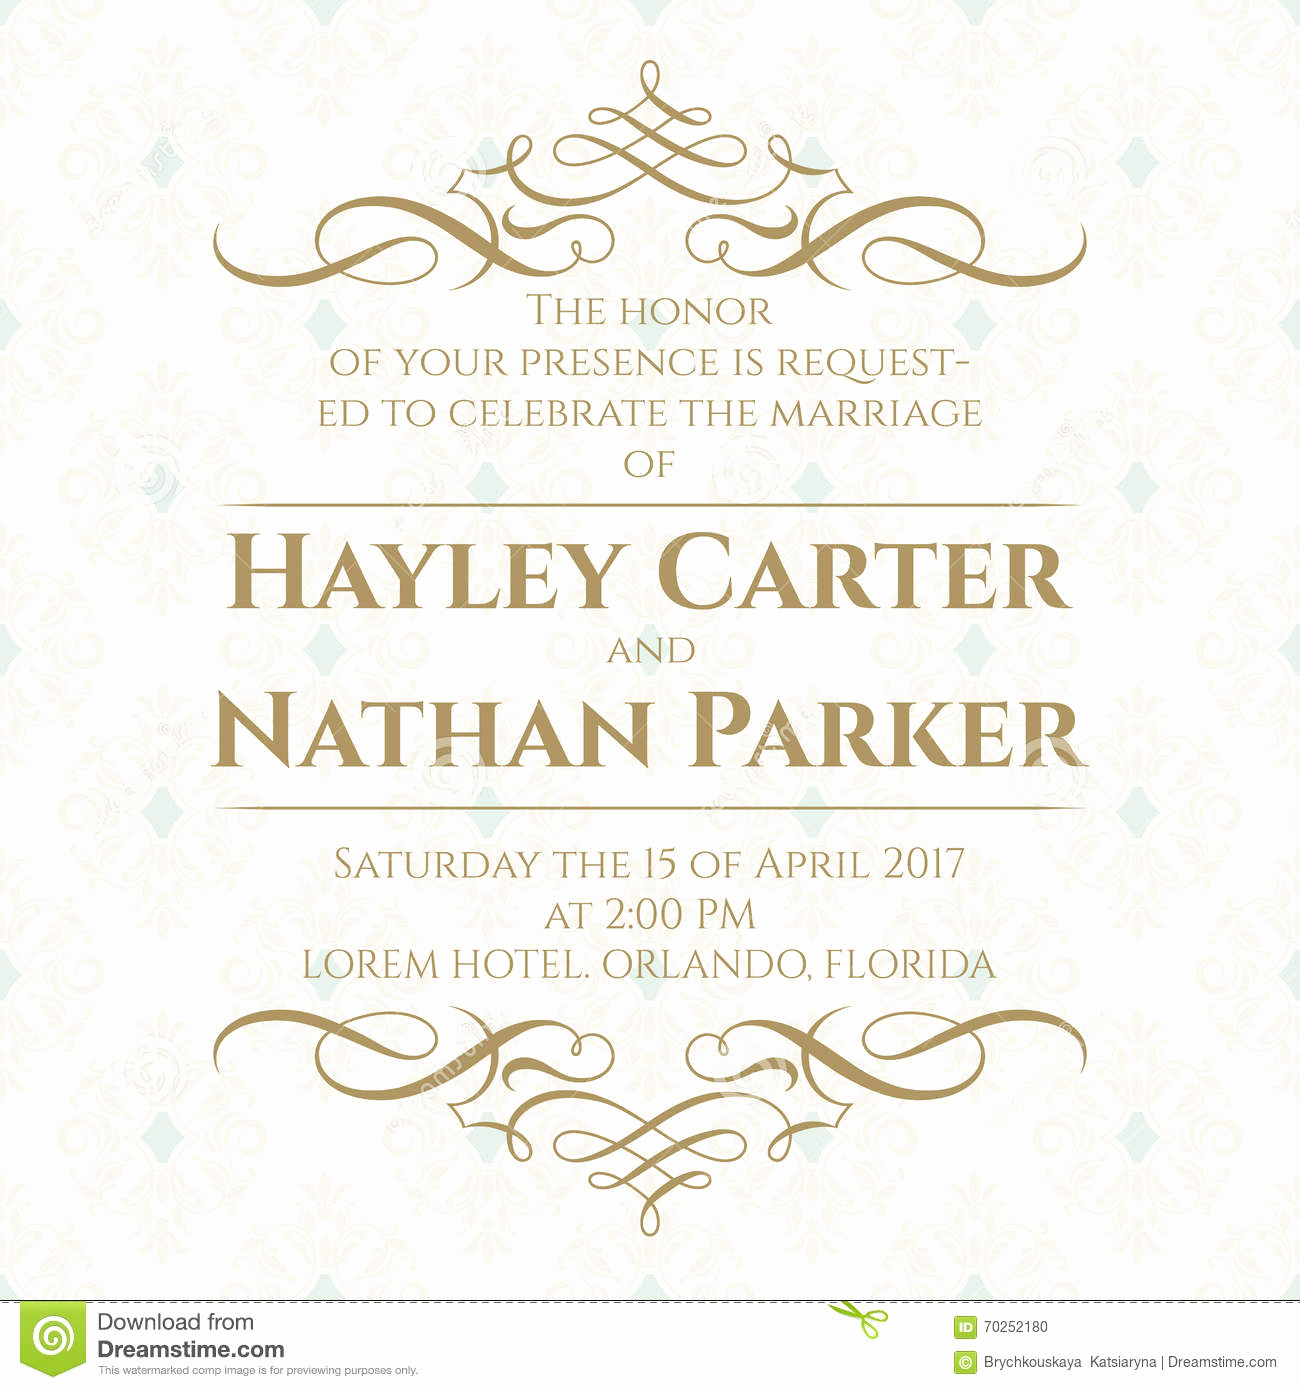 Wedding Invitation Graphic Design Beautiful Calligraphic Border and Seamless Classic Background